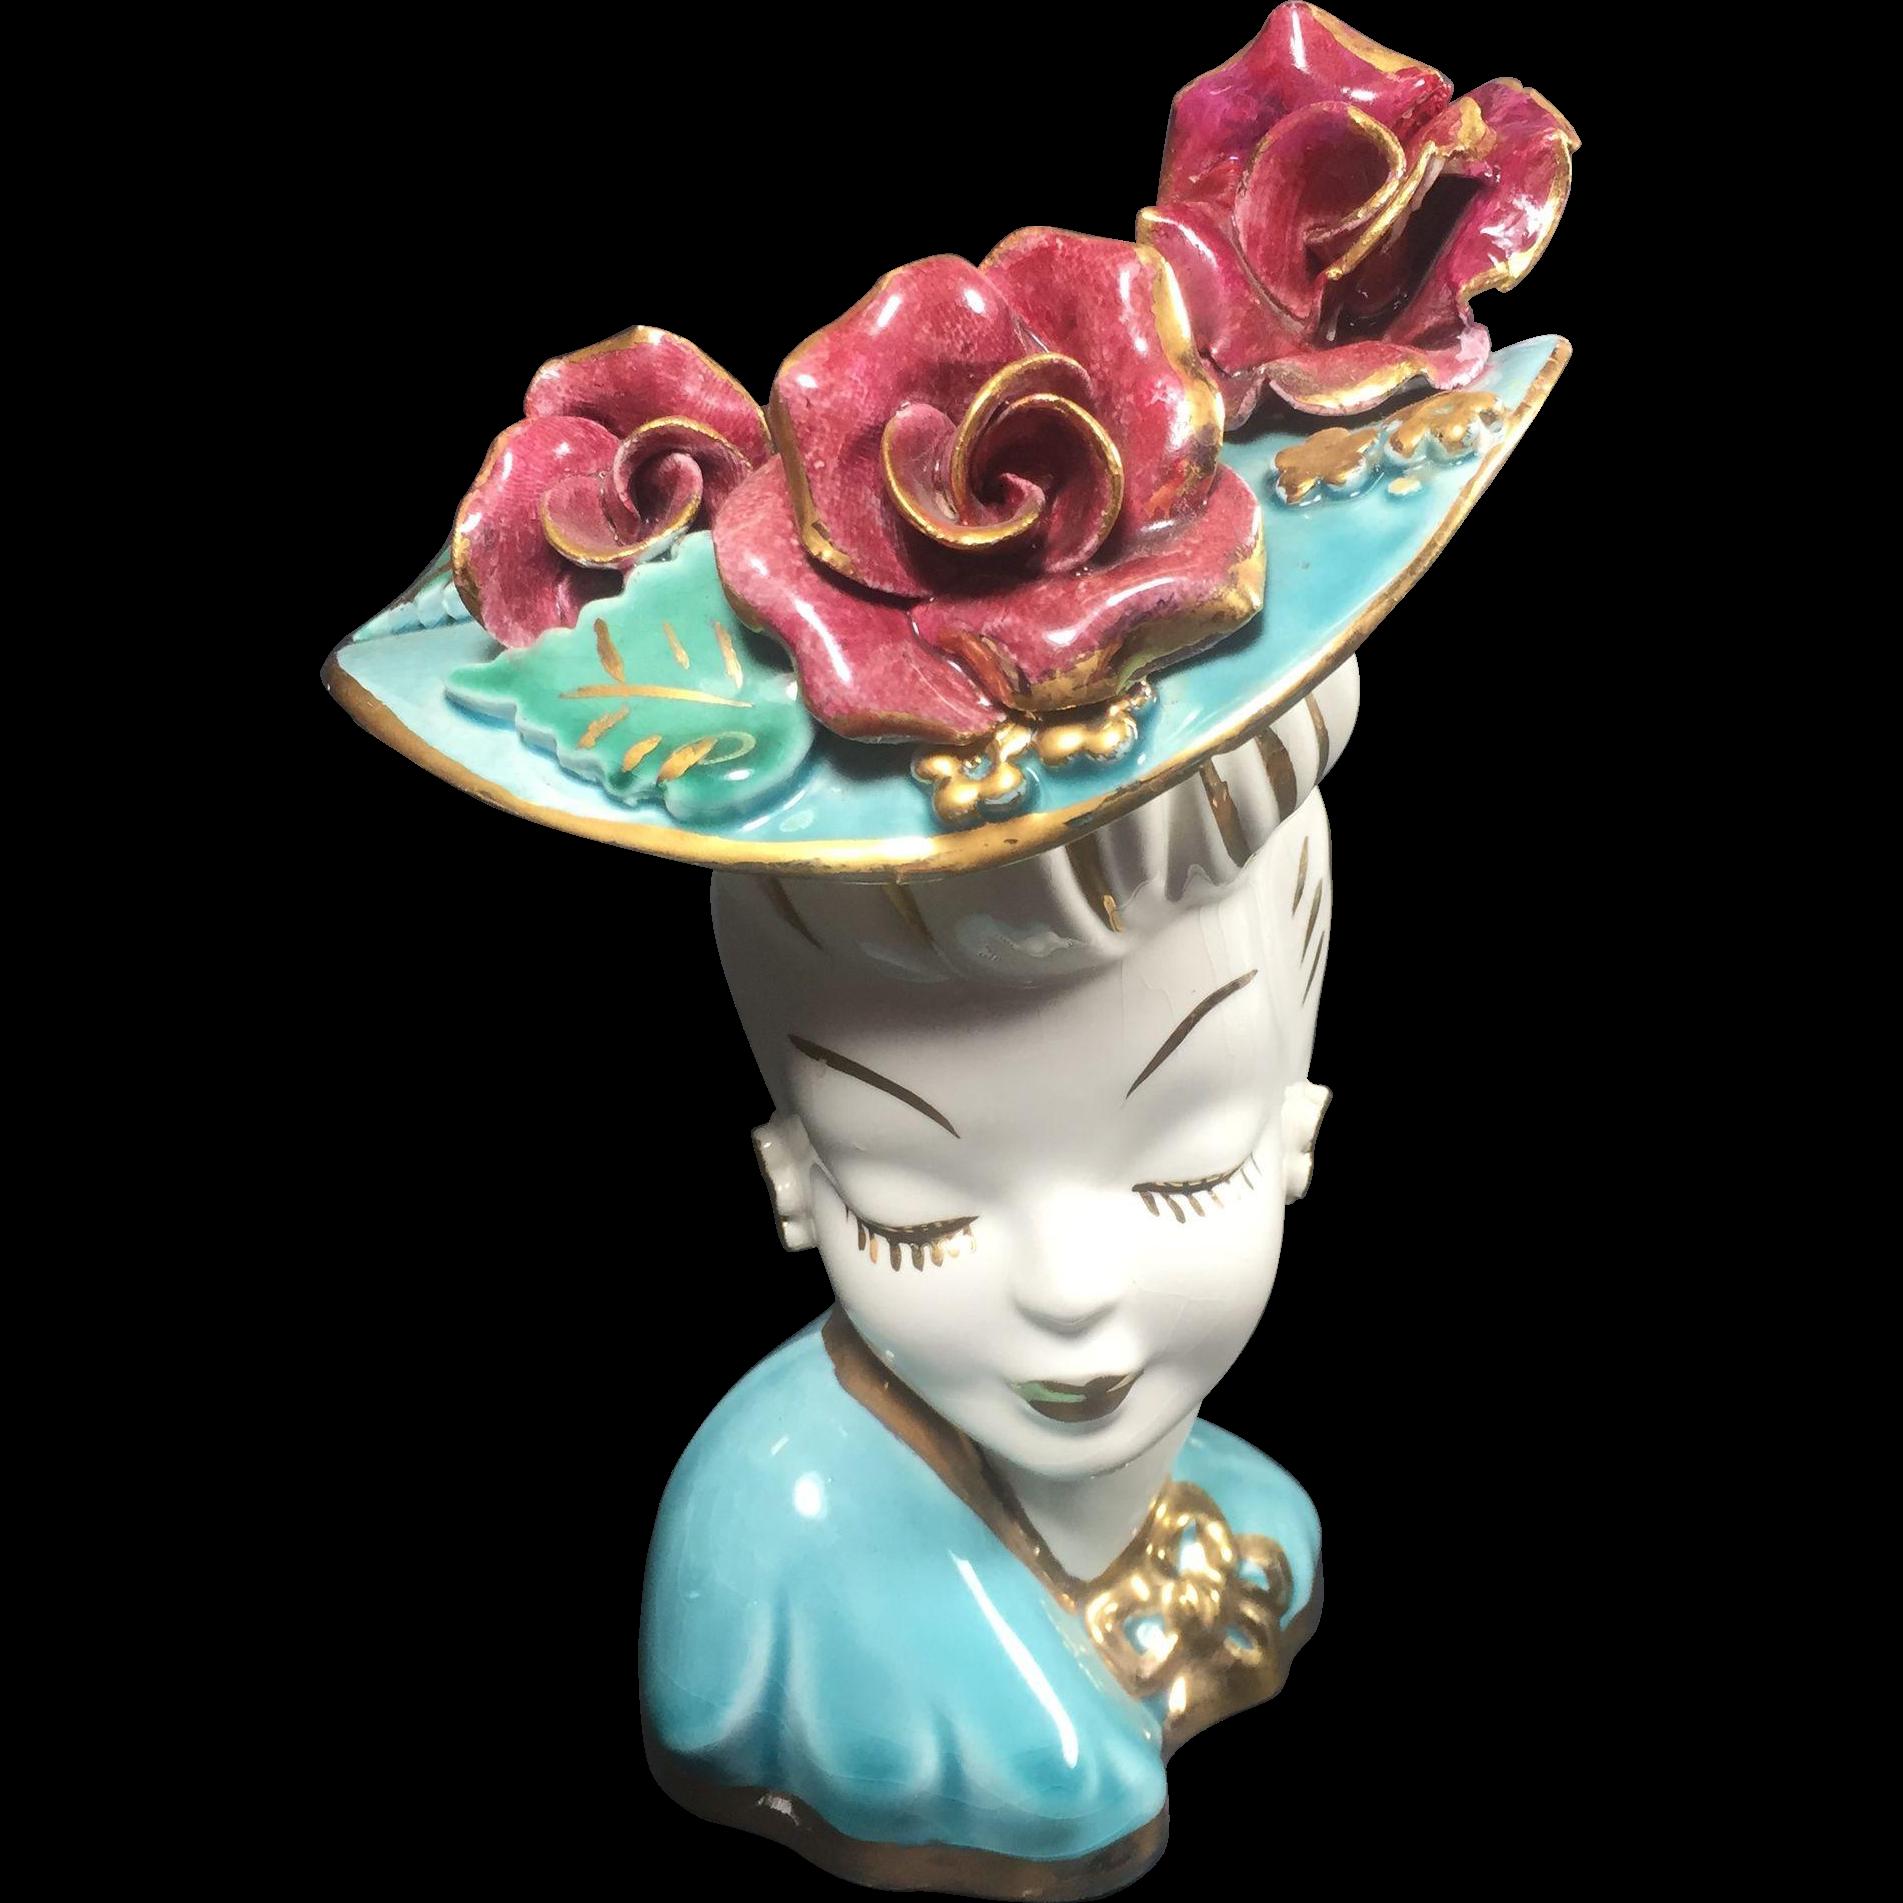 Vintage Lady Head Vase Glamour Girl w Huge Applied Roses